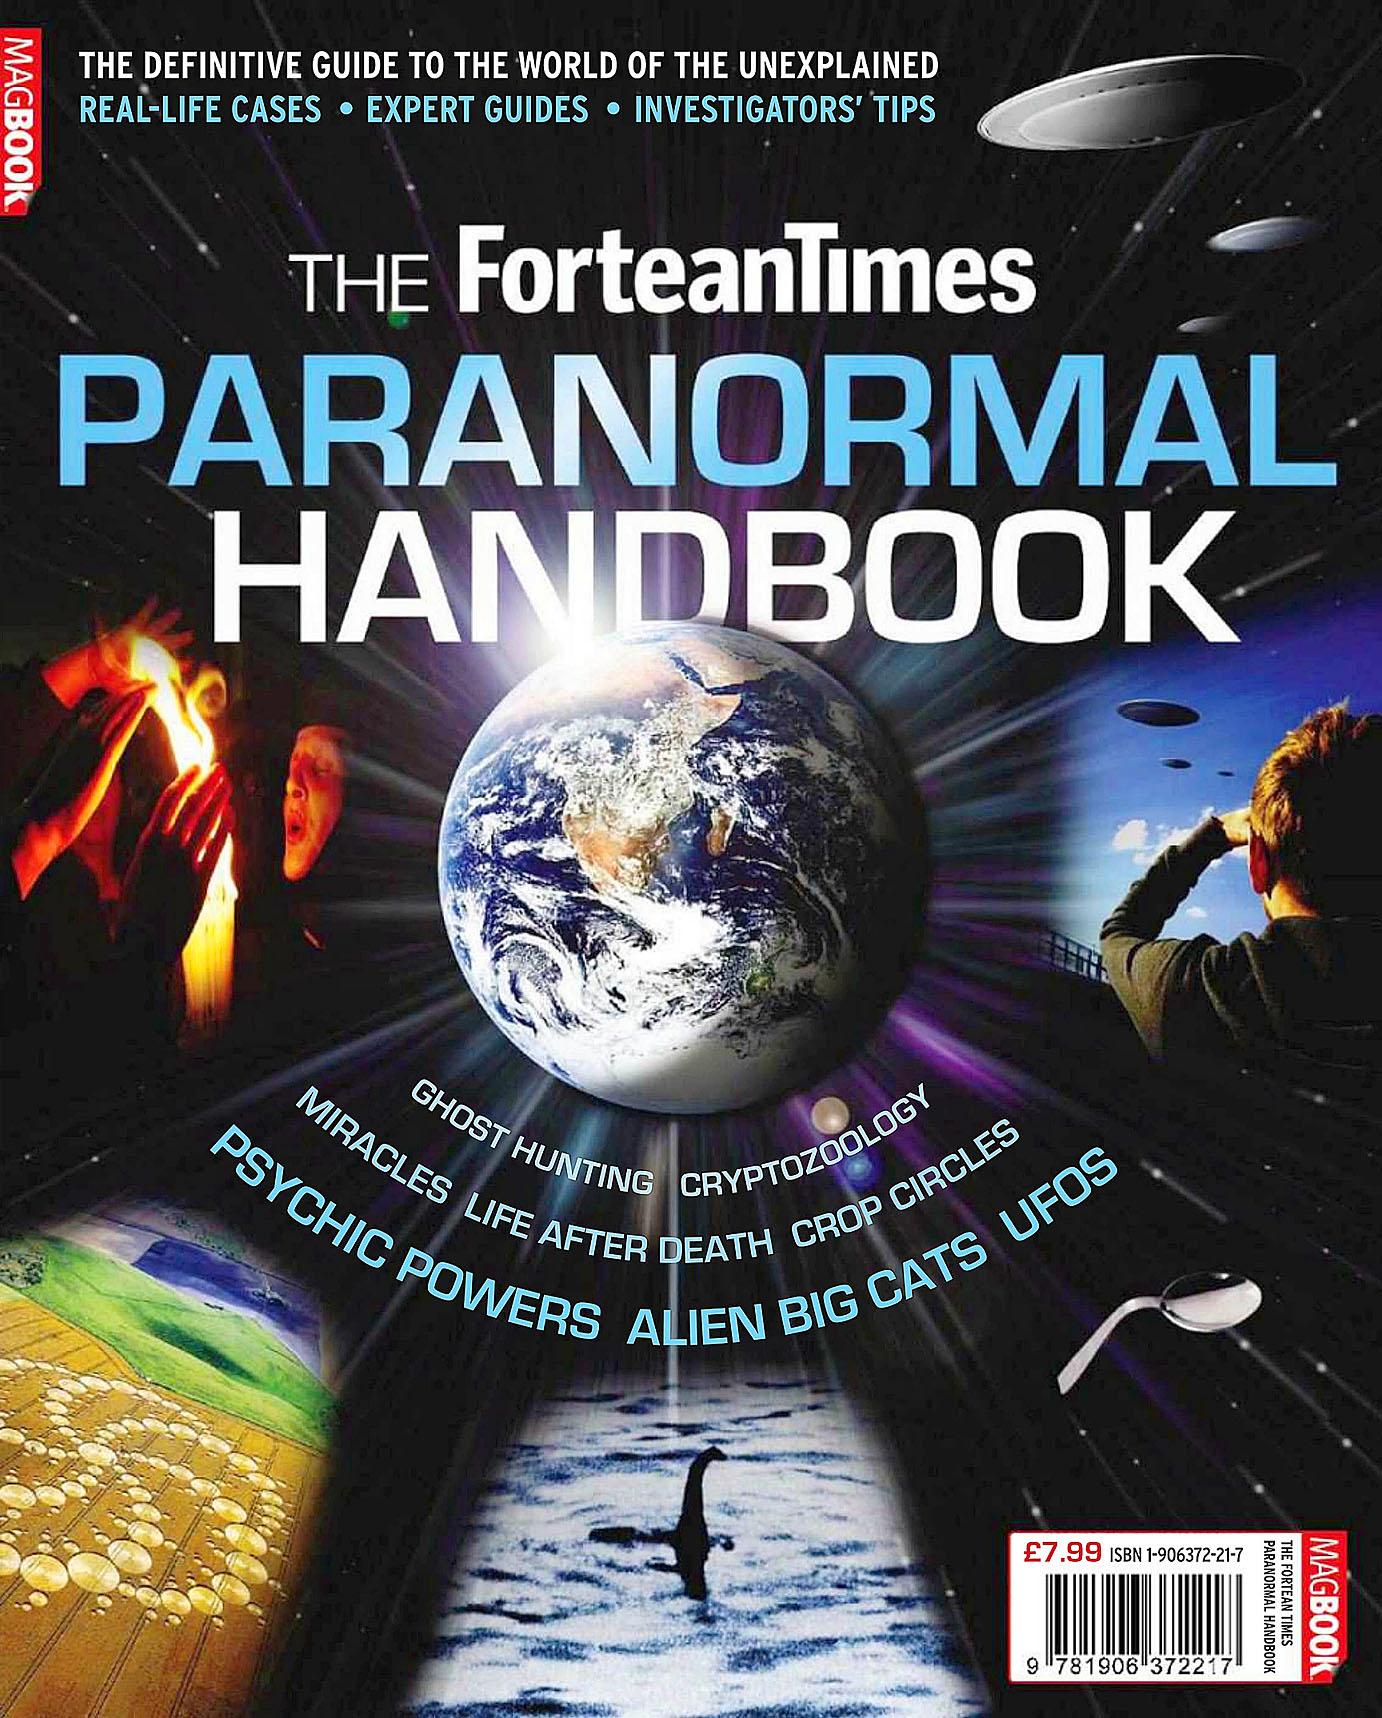 Fortean Times Paranormal Handbook.jpg